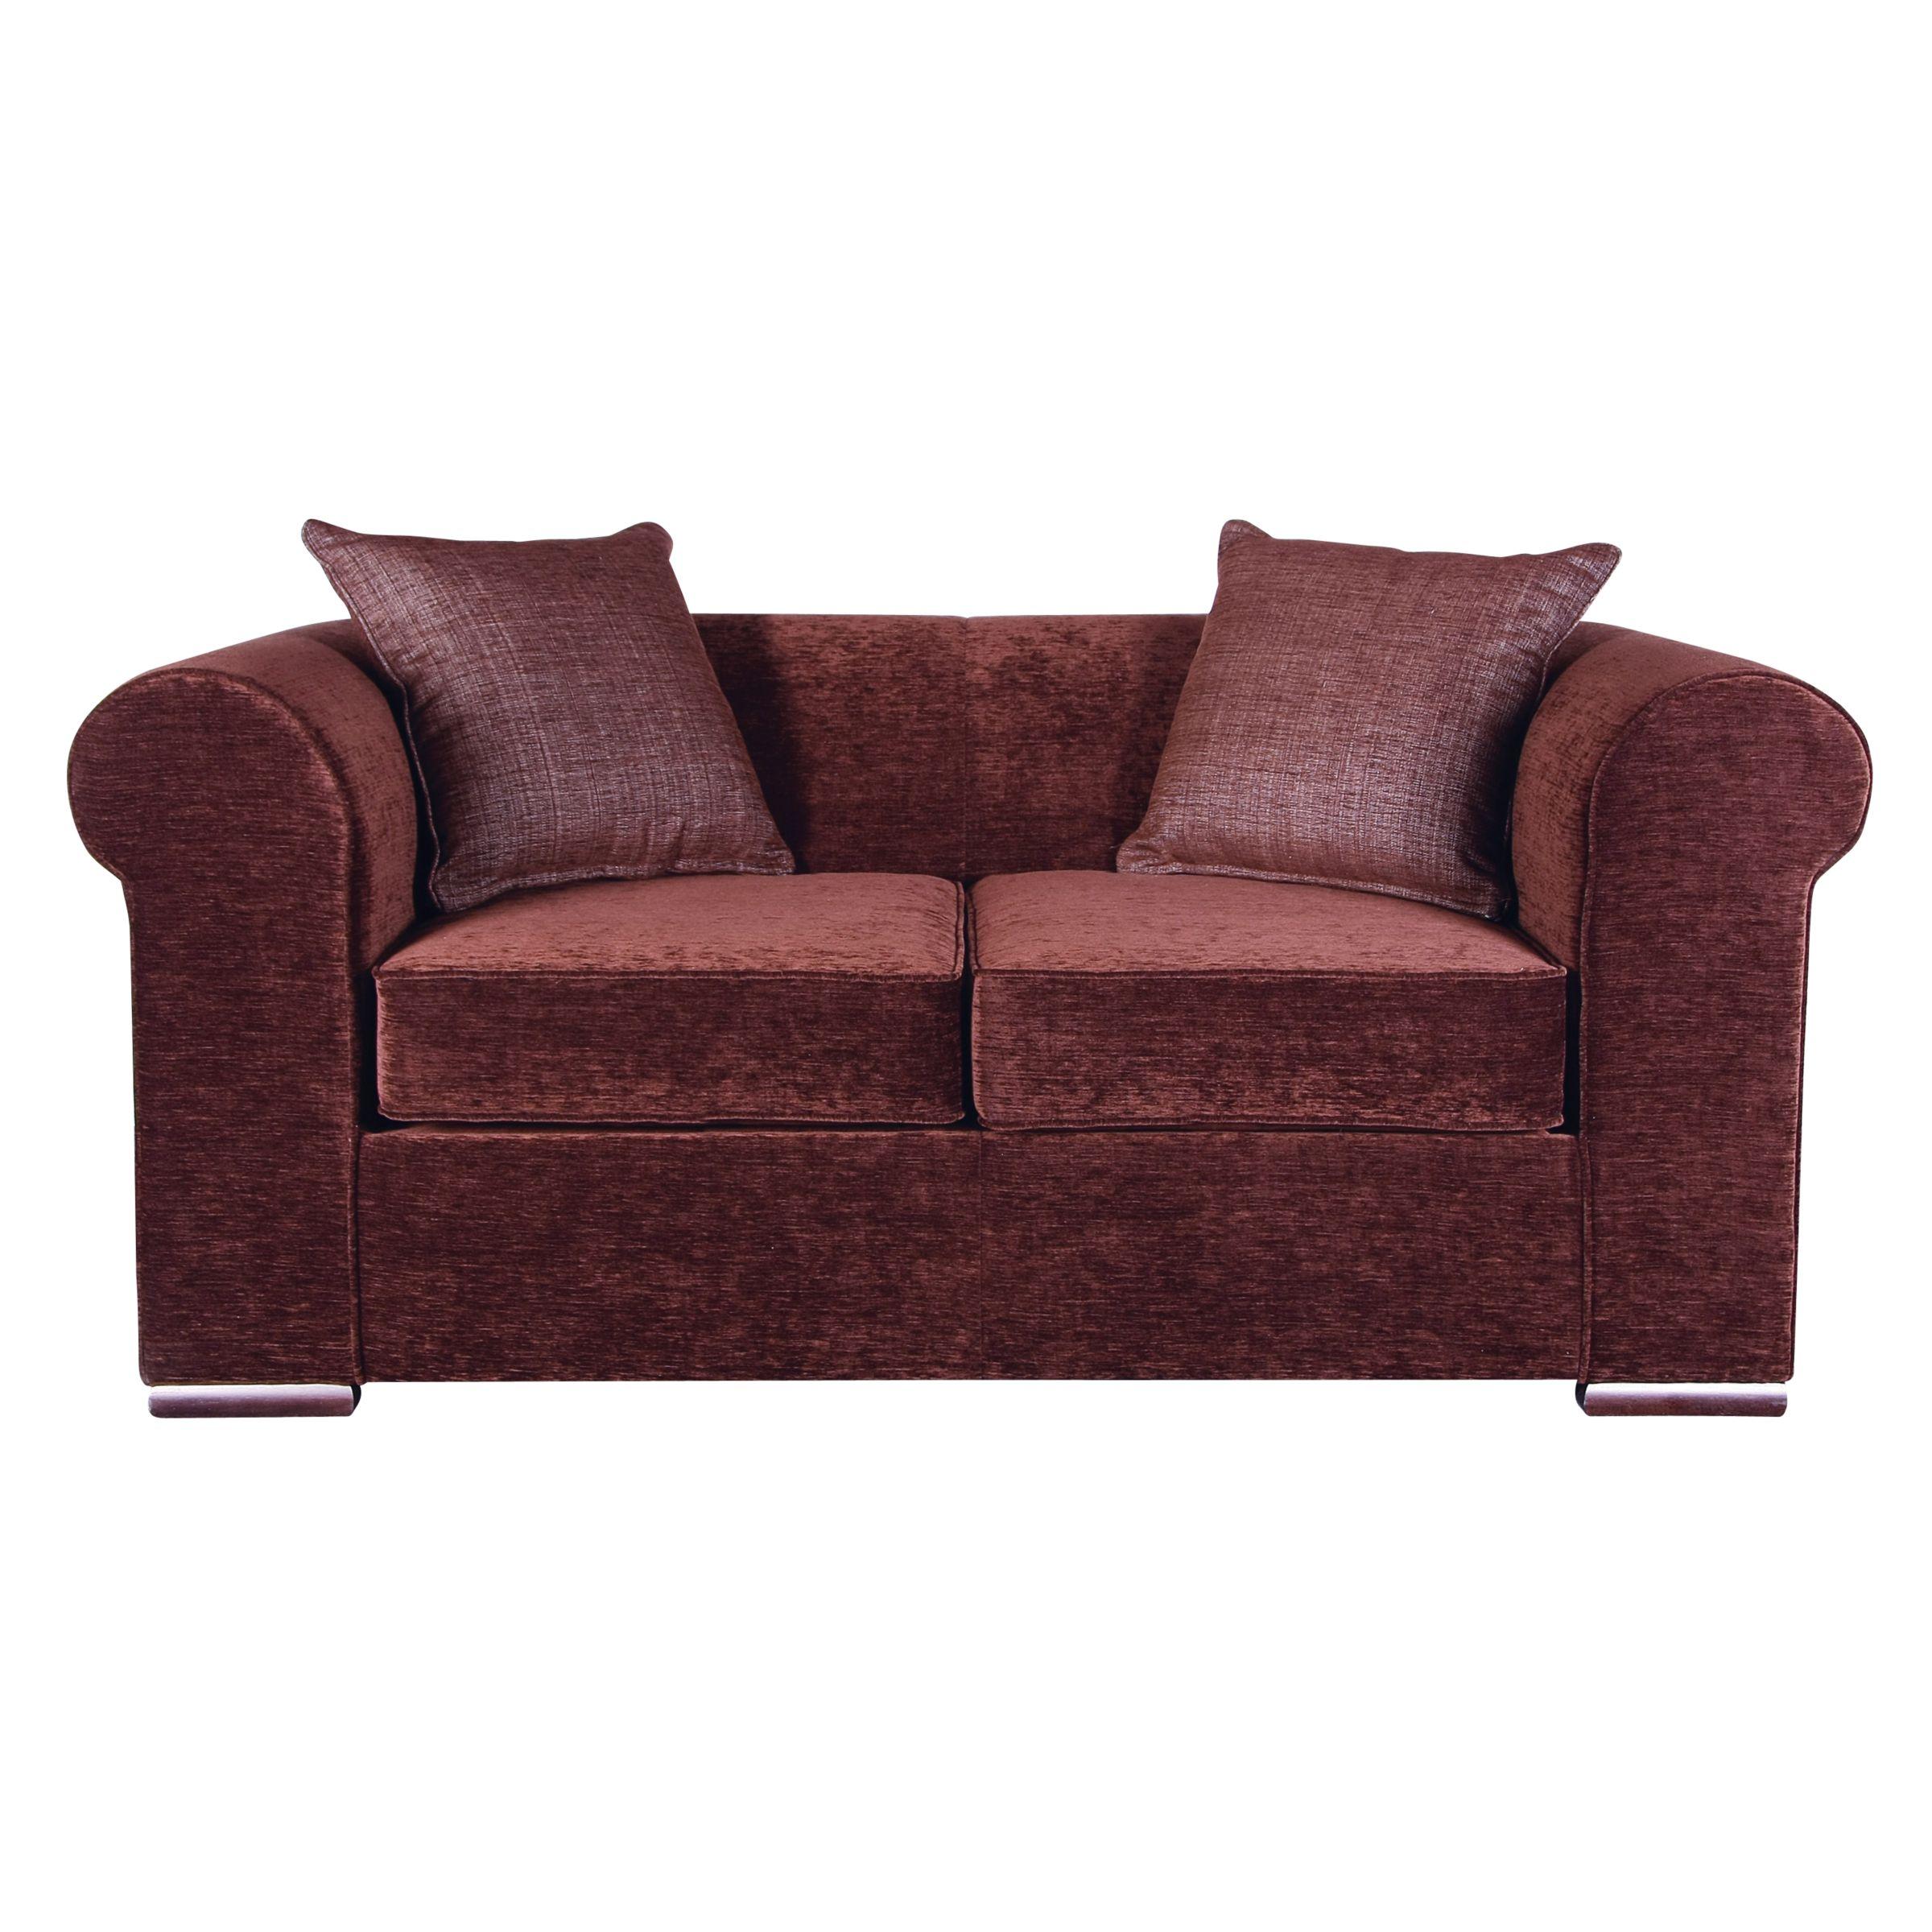 medium sofa bed lane jasmine reclining reviews john lewis beds